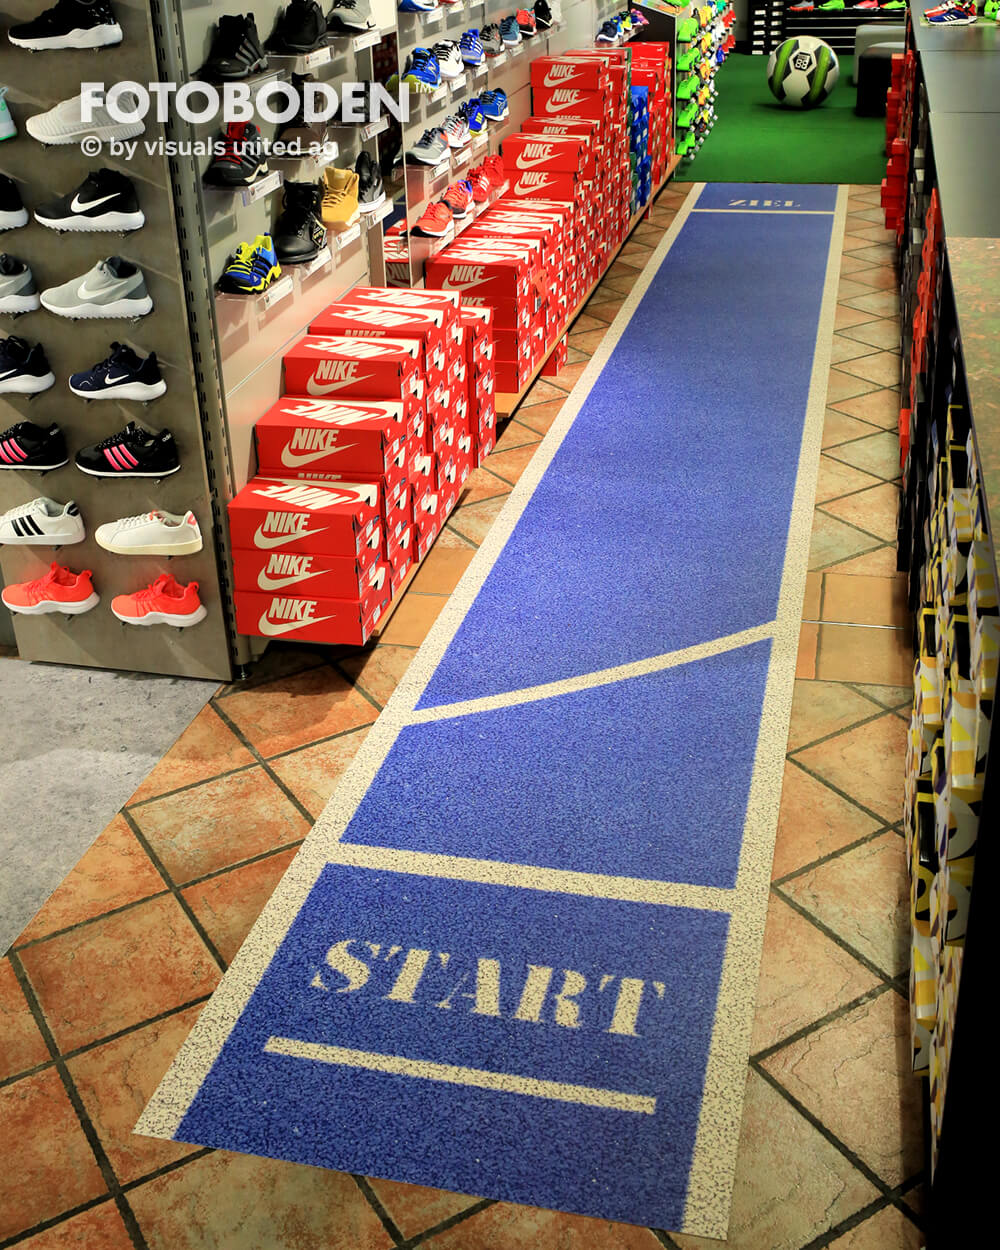 Sport8Ladenbau Ladengestaltung Fußboden Verkaufsfläche Bodengestaltung Boden Foto Fotoboden Fotomotiv Motiv Druck Visual Merchandising Point Of Sale POS